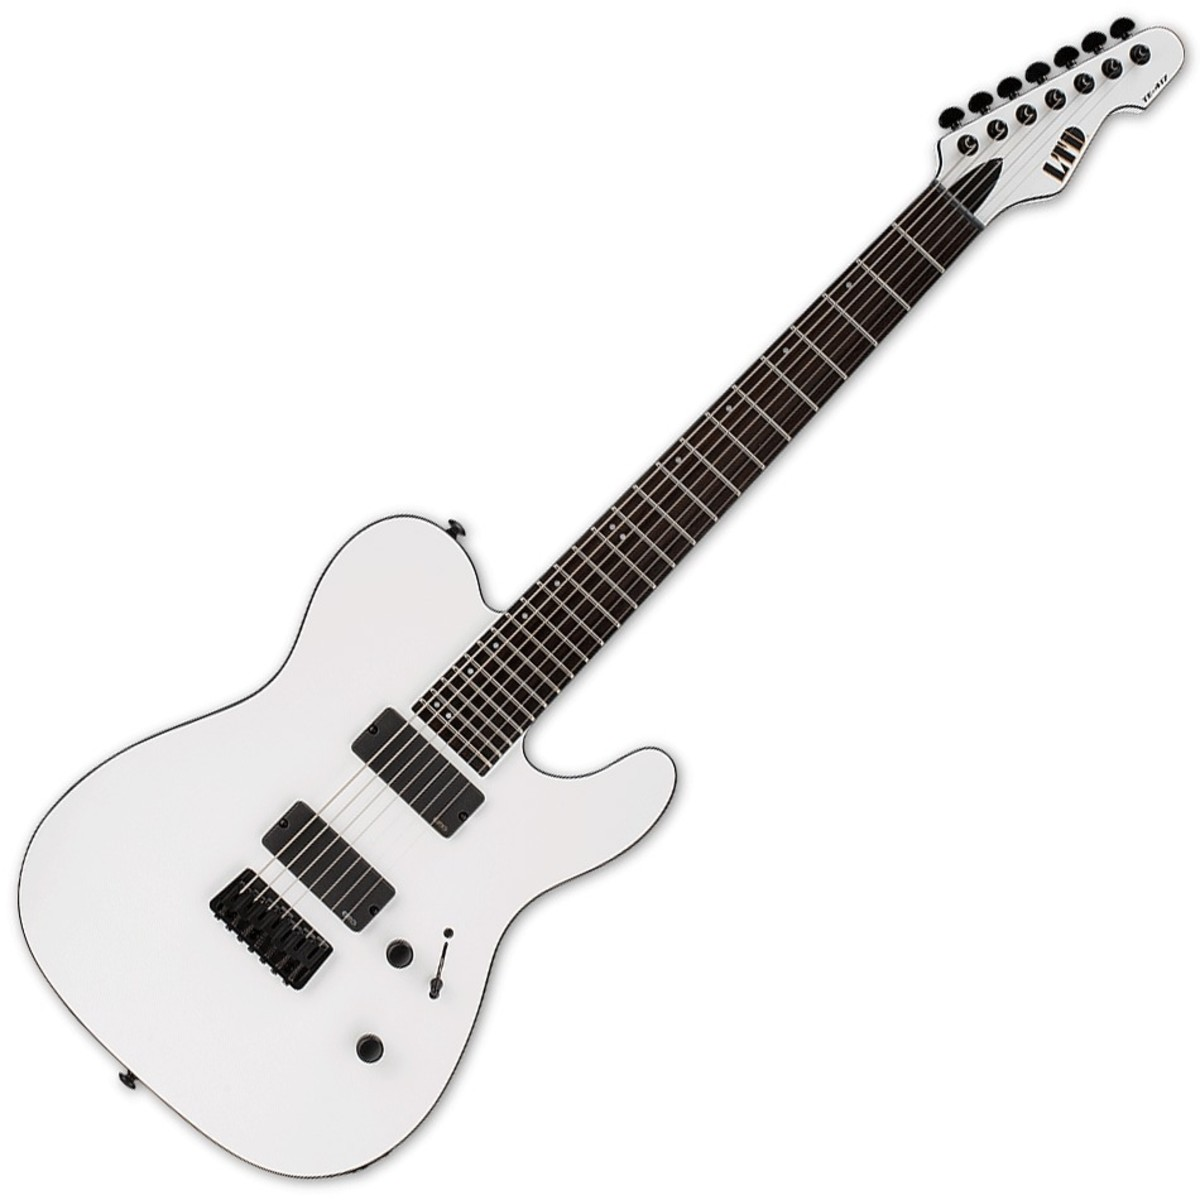 Esp Ltd Te 417 Electric Guitar Snow White Satin At Gear4music Emg707 Ibanez Wiring Help Sevenstringorg